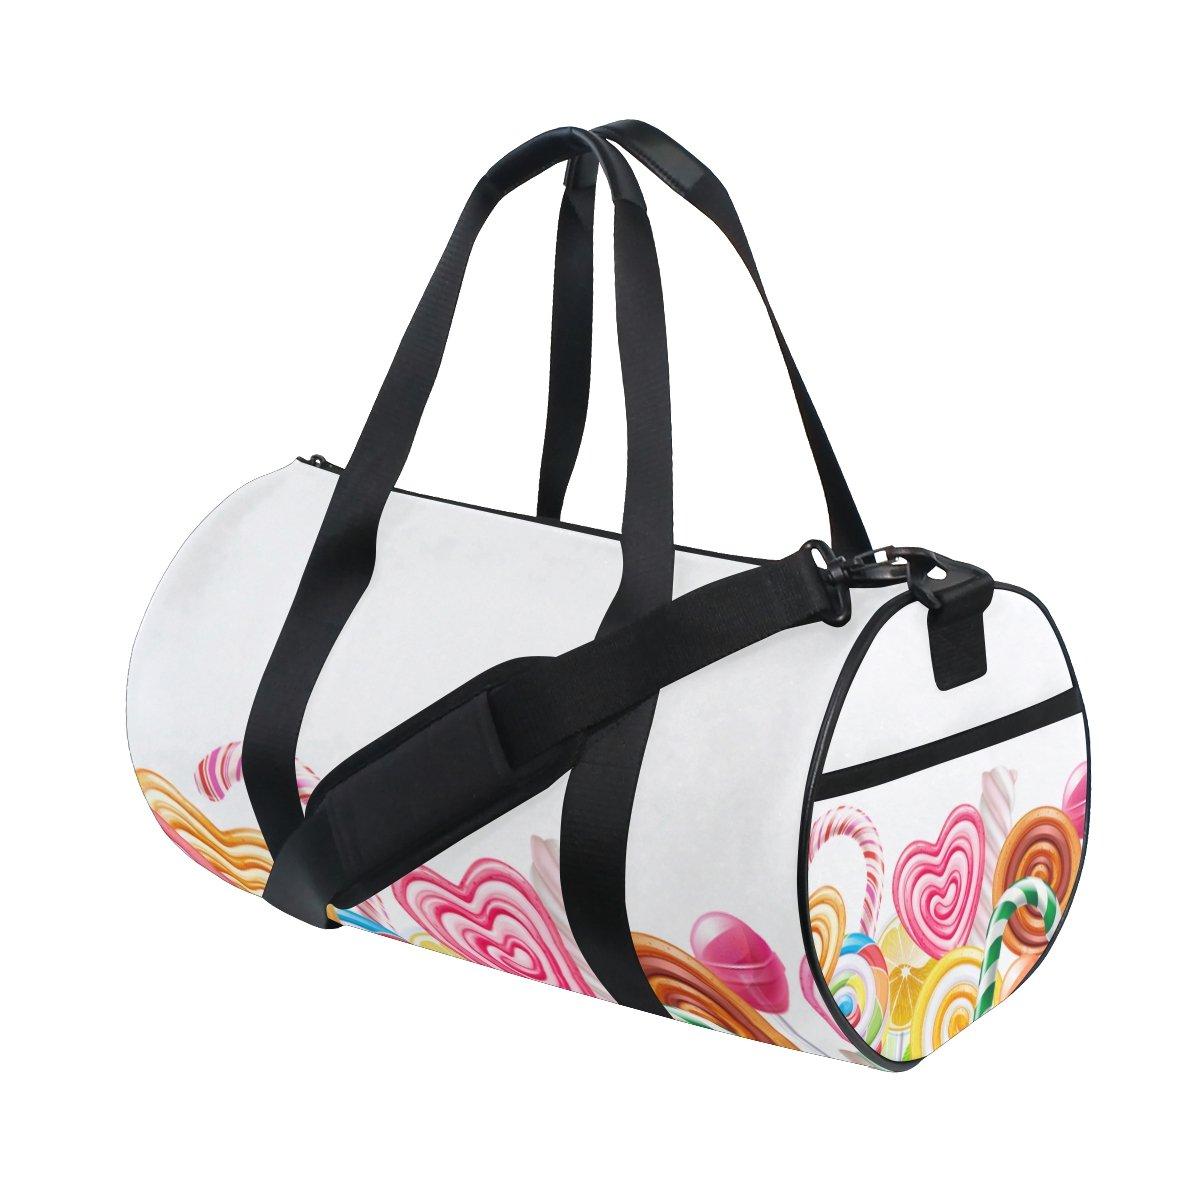 U LIFE Valentines Day Candy Heart Love You Summer Spring Wedding Sports Gym Shoulder Handy Duffel Bags for Women Men Kids Boys Girls